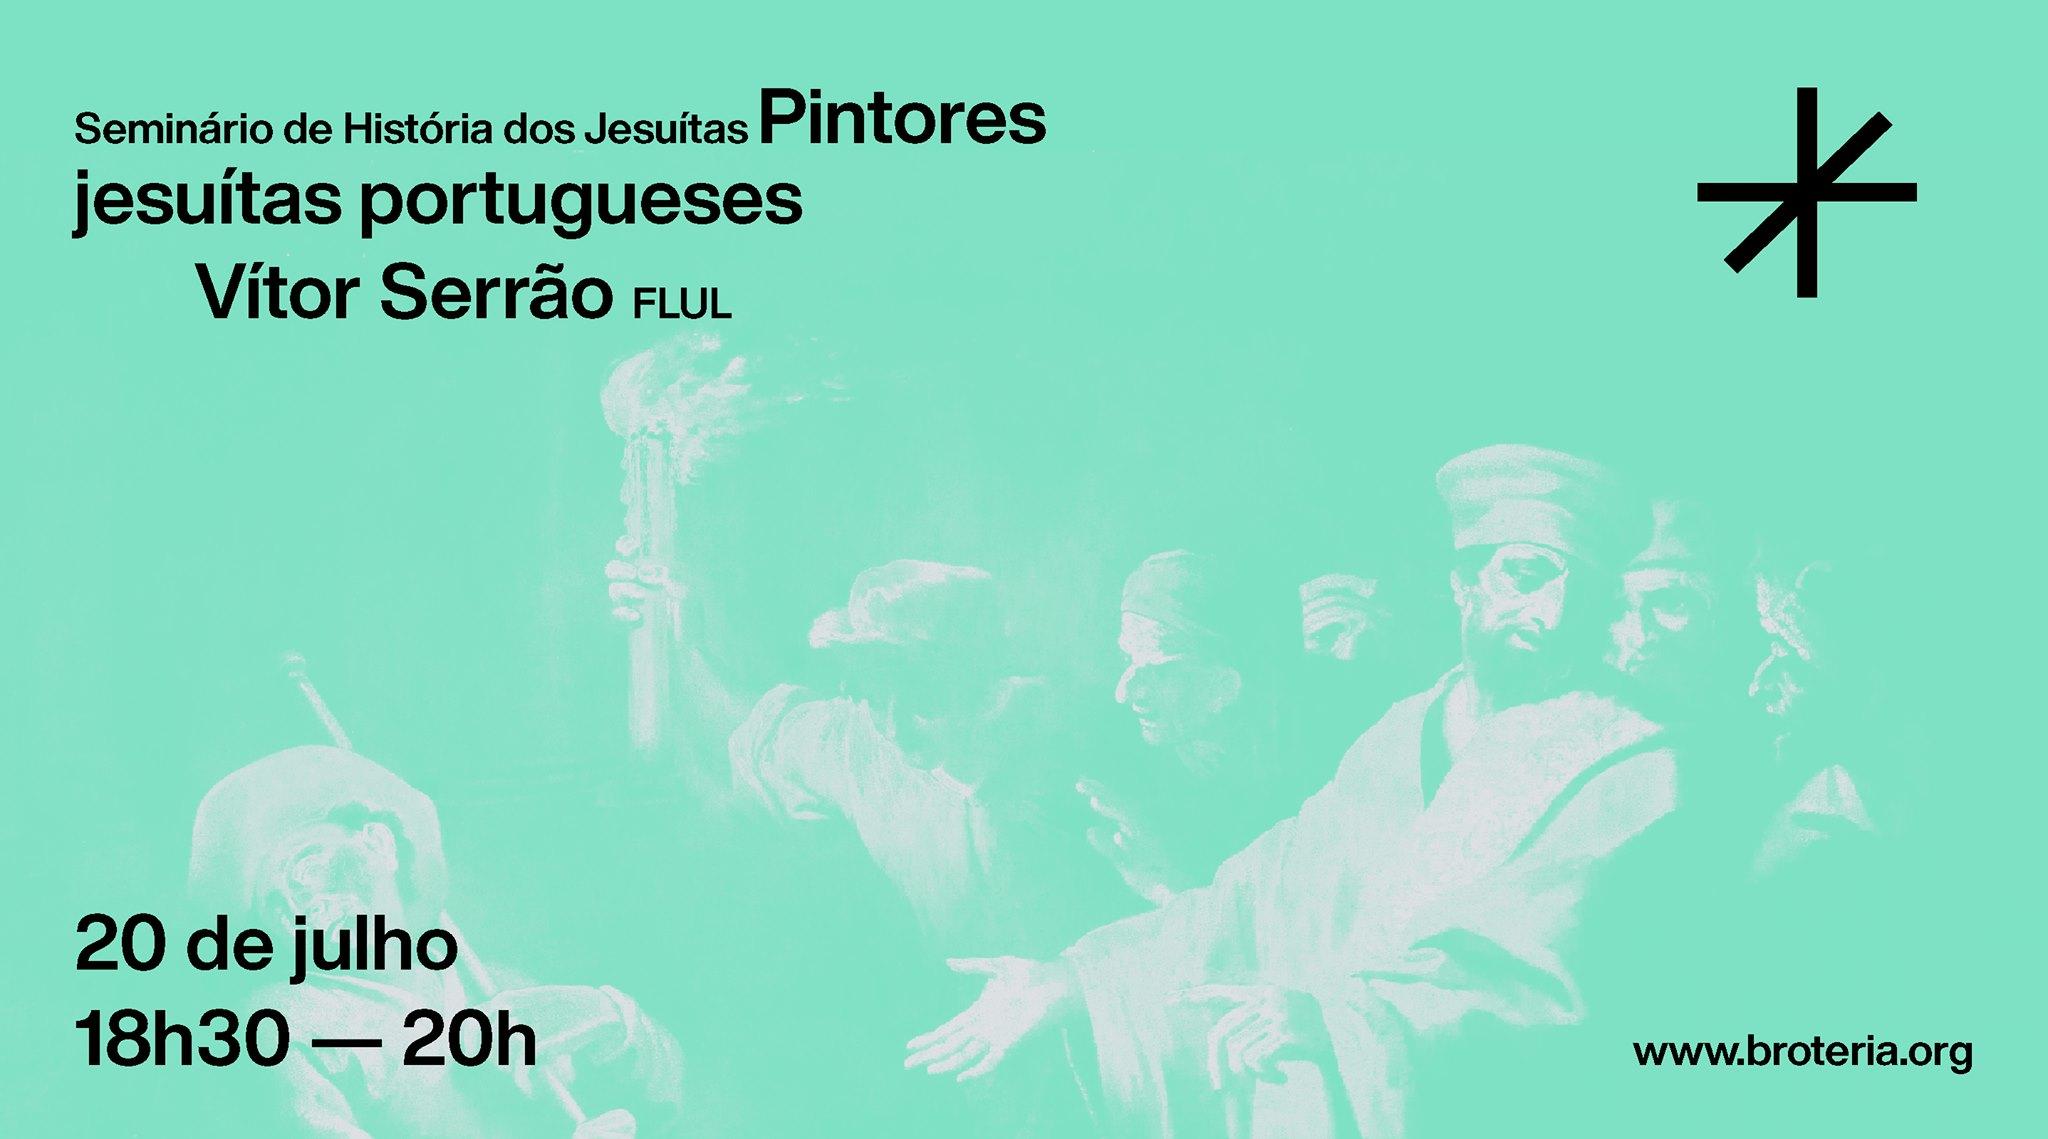 Seminário | Pintores jesuítas portugueses